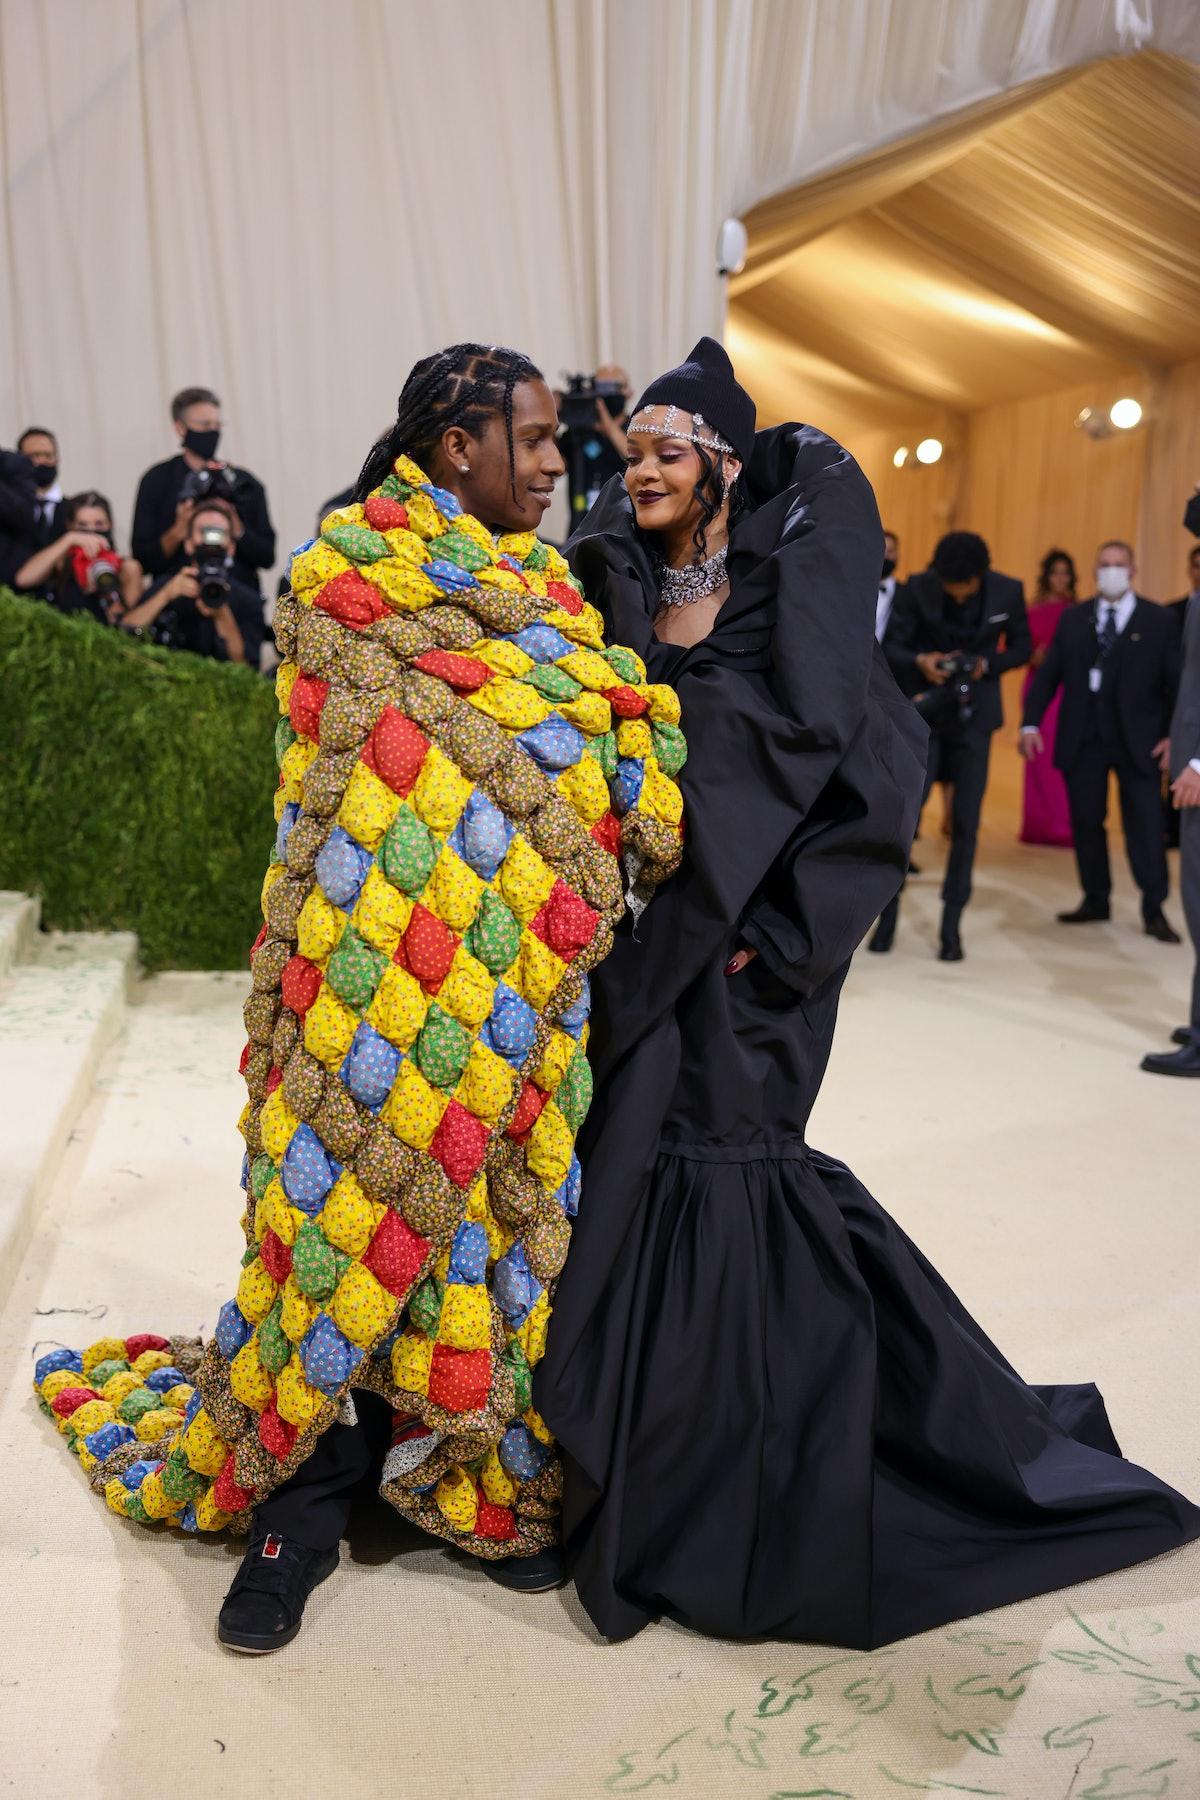 ASAP and Rihanna